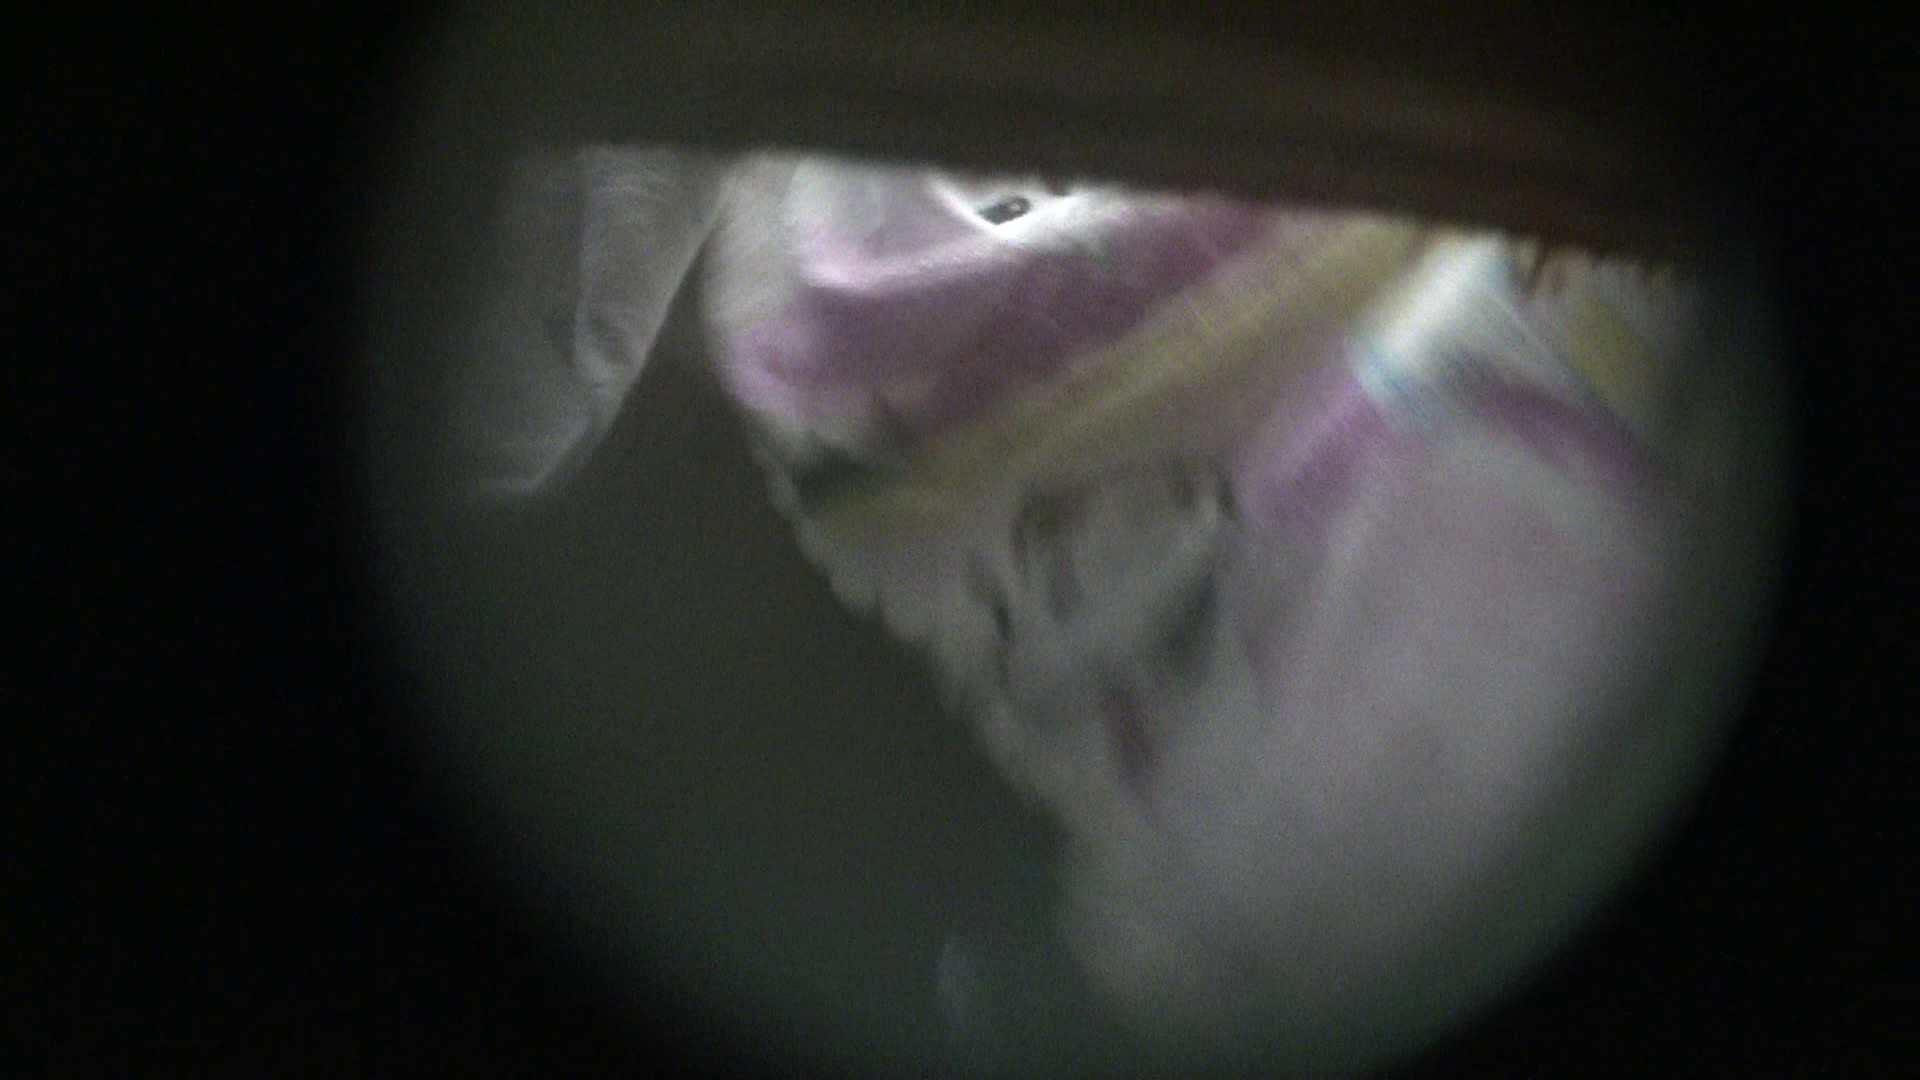 NO.03 ムッチリ色白ボディーに少し大きな乳輪 ギャルズ ヌード画像 88画像 23